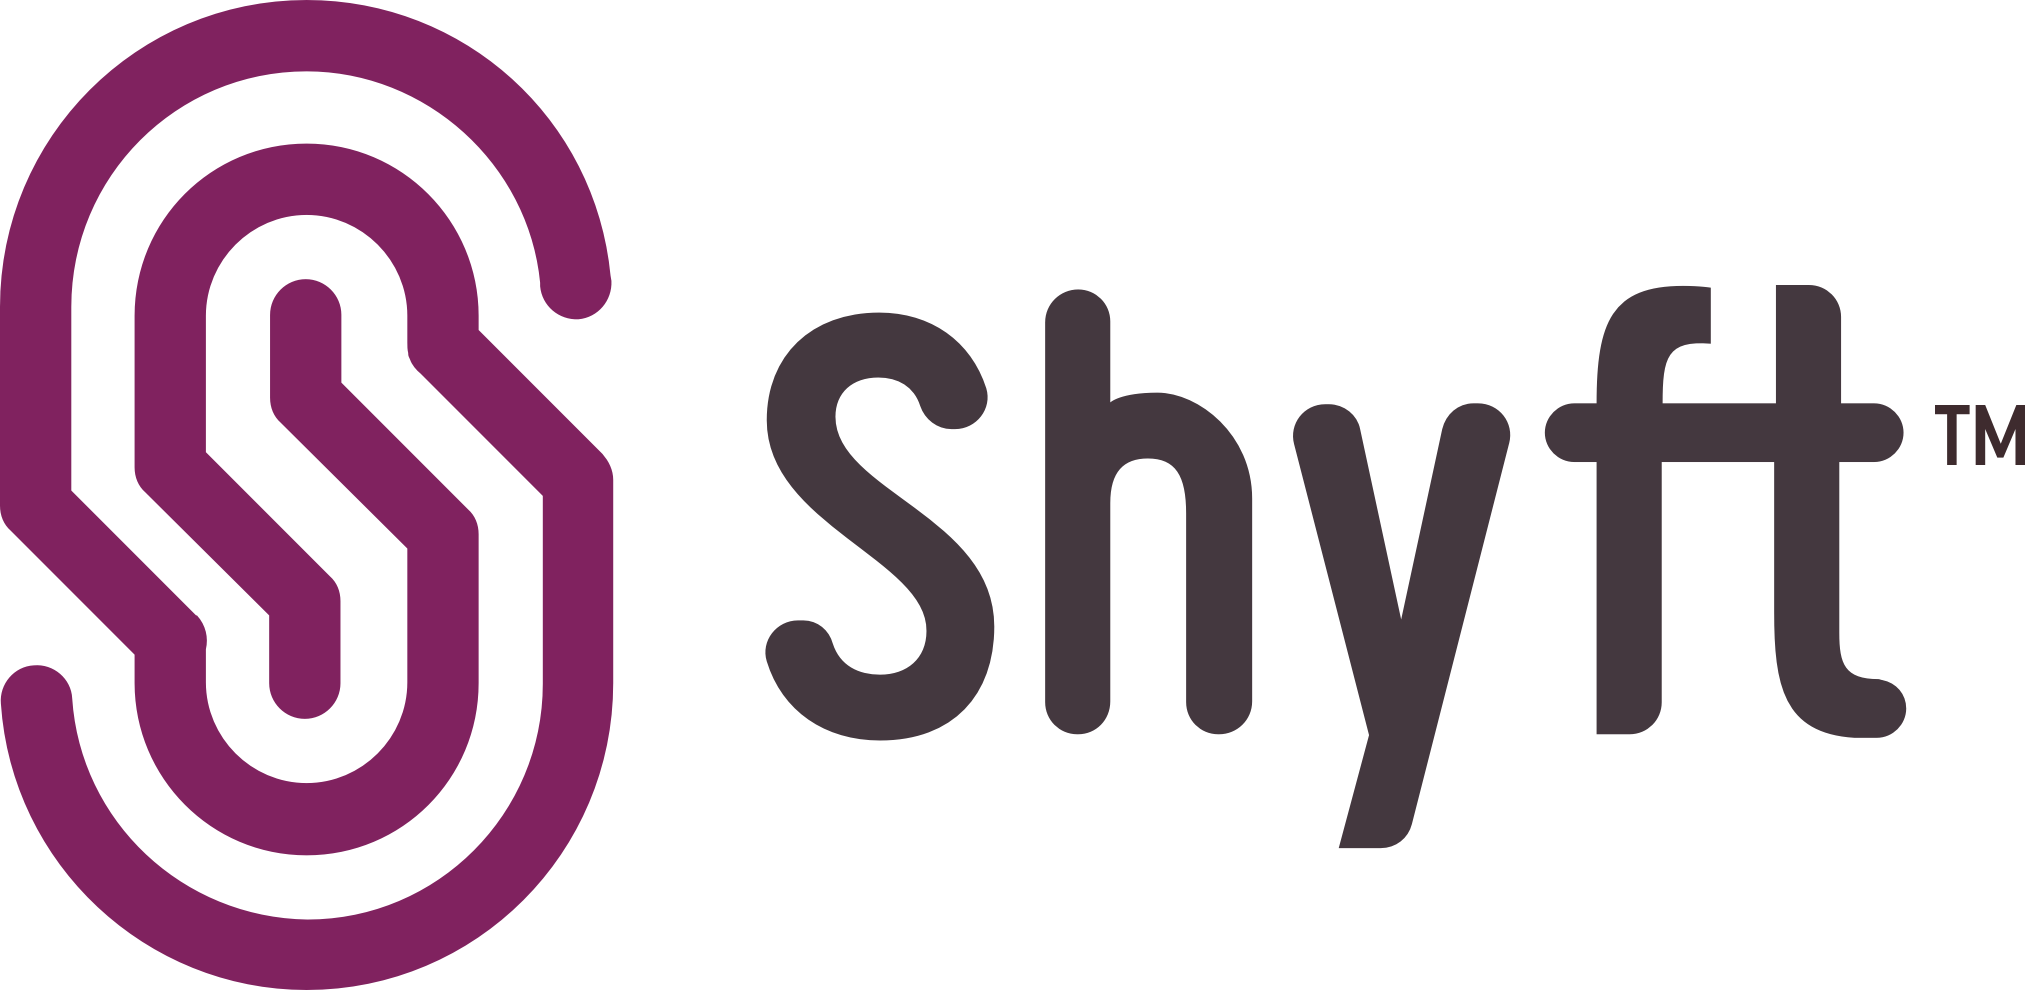 shyft-logo-horizontal-tm.png